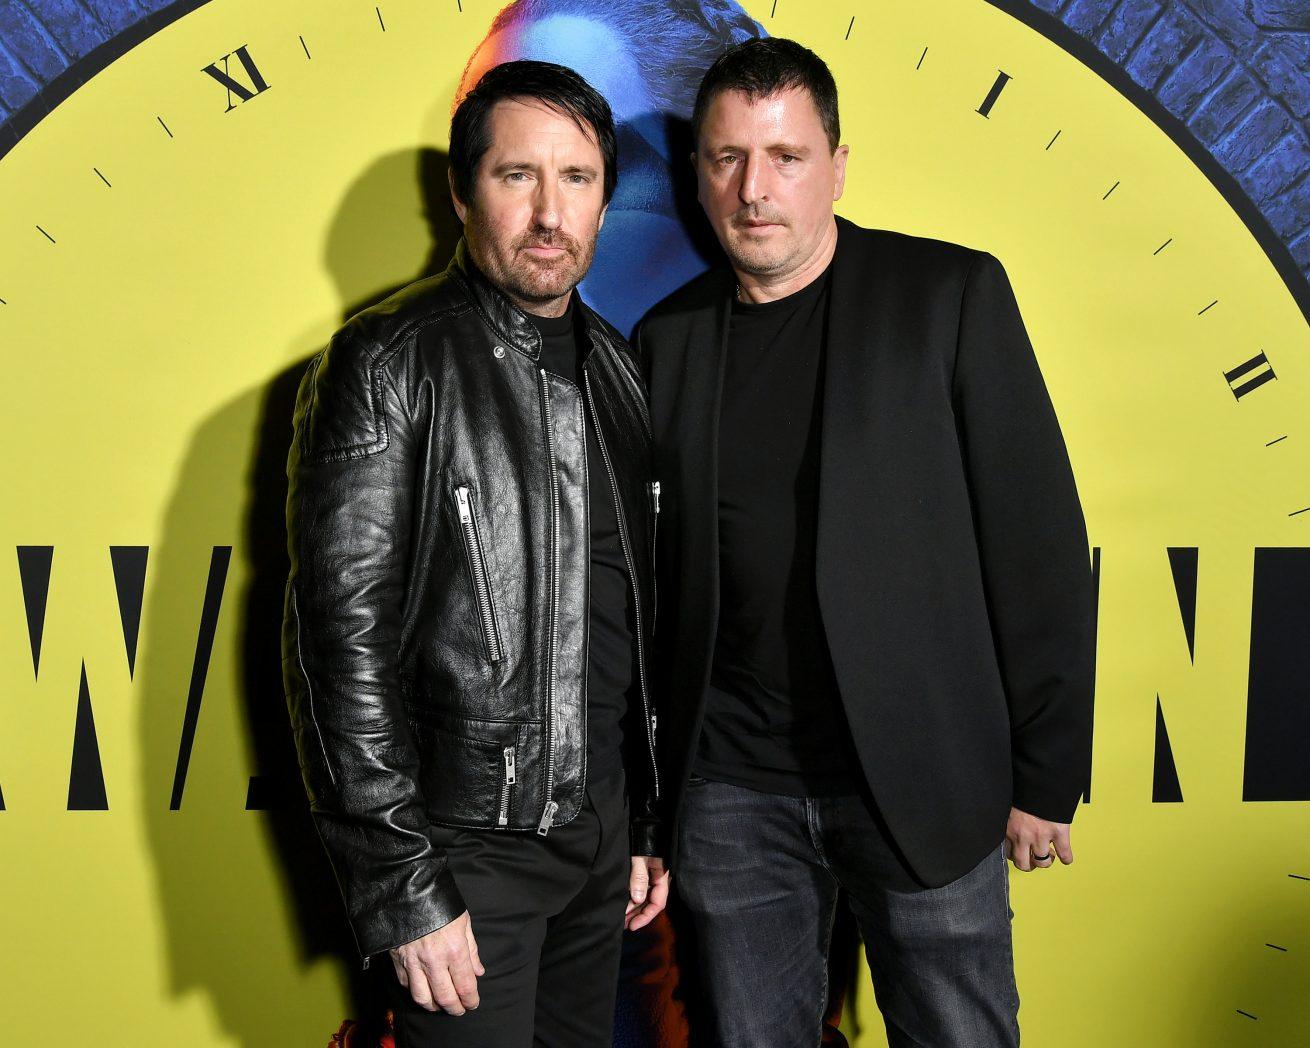 trent reznor ve atticus ross imzalı watchmen soundtrack part 2 yayında